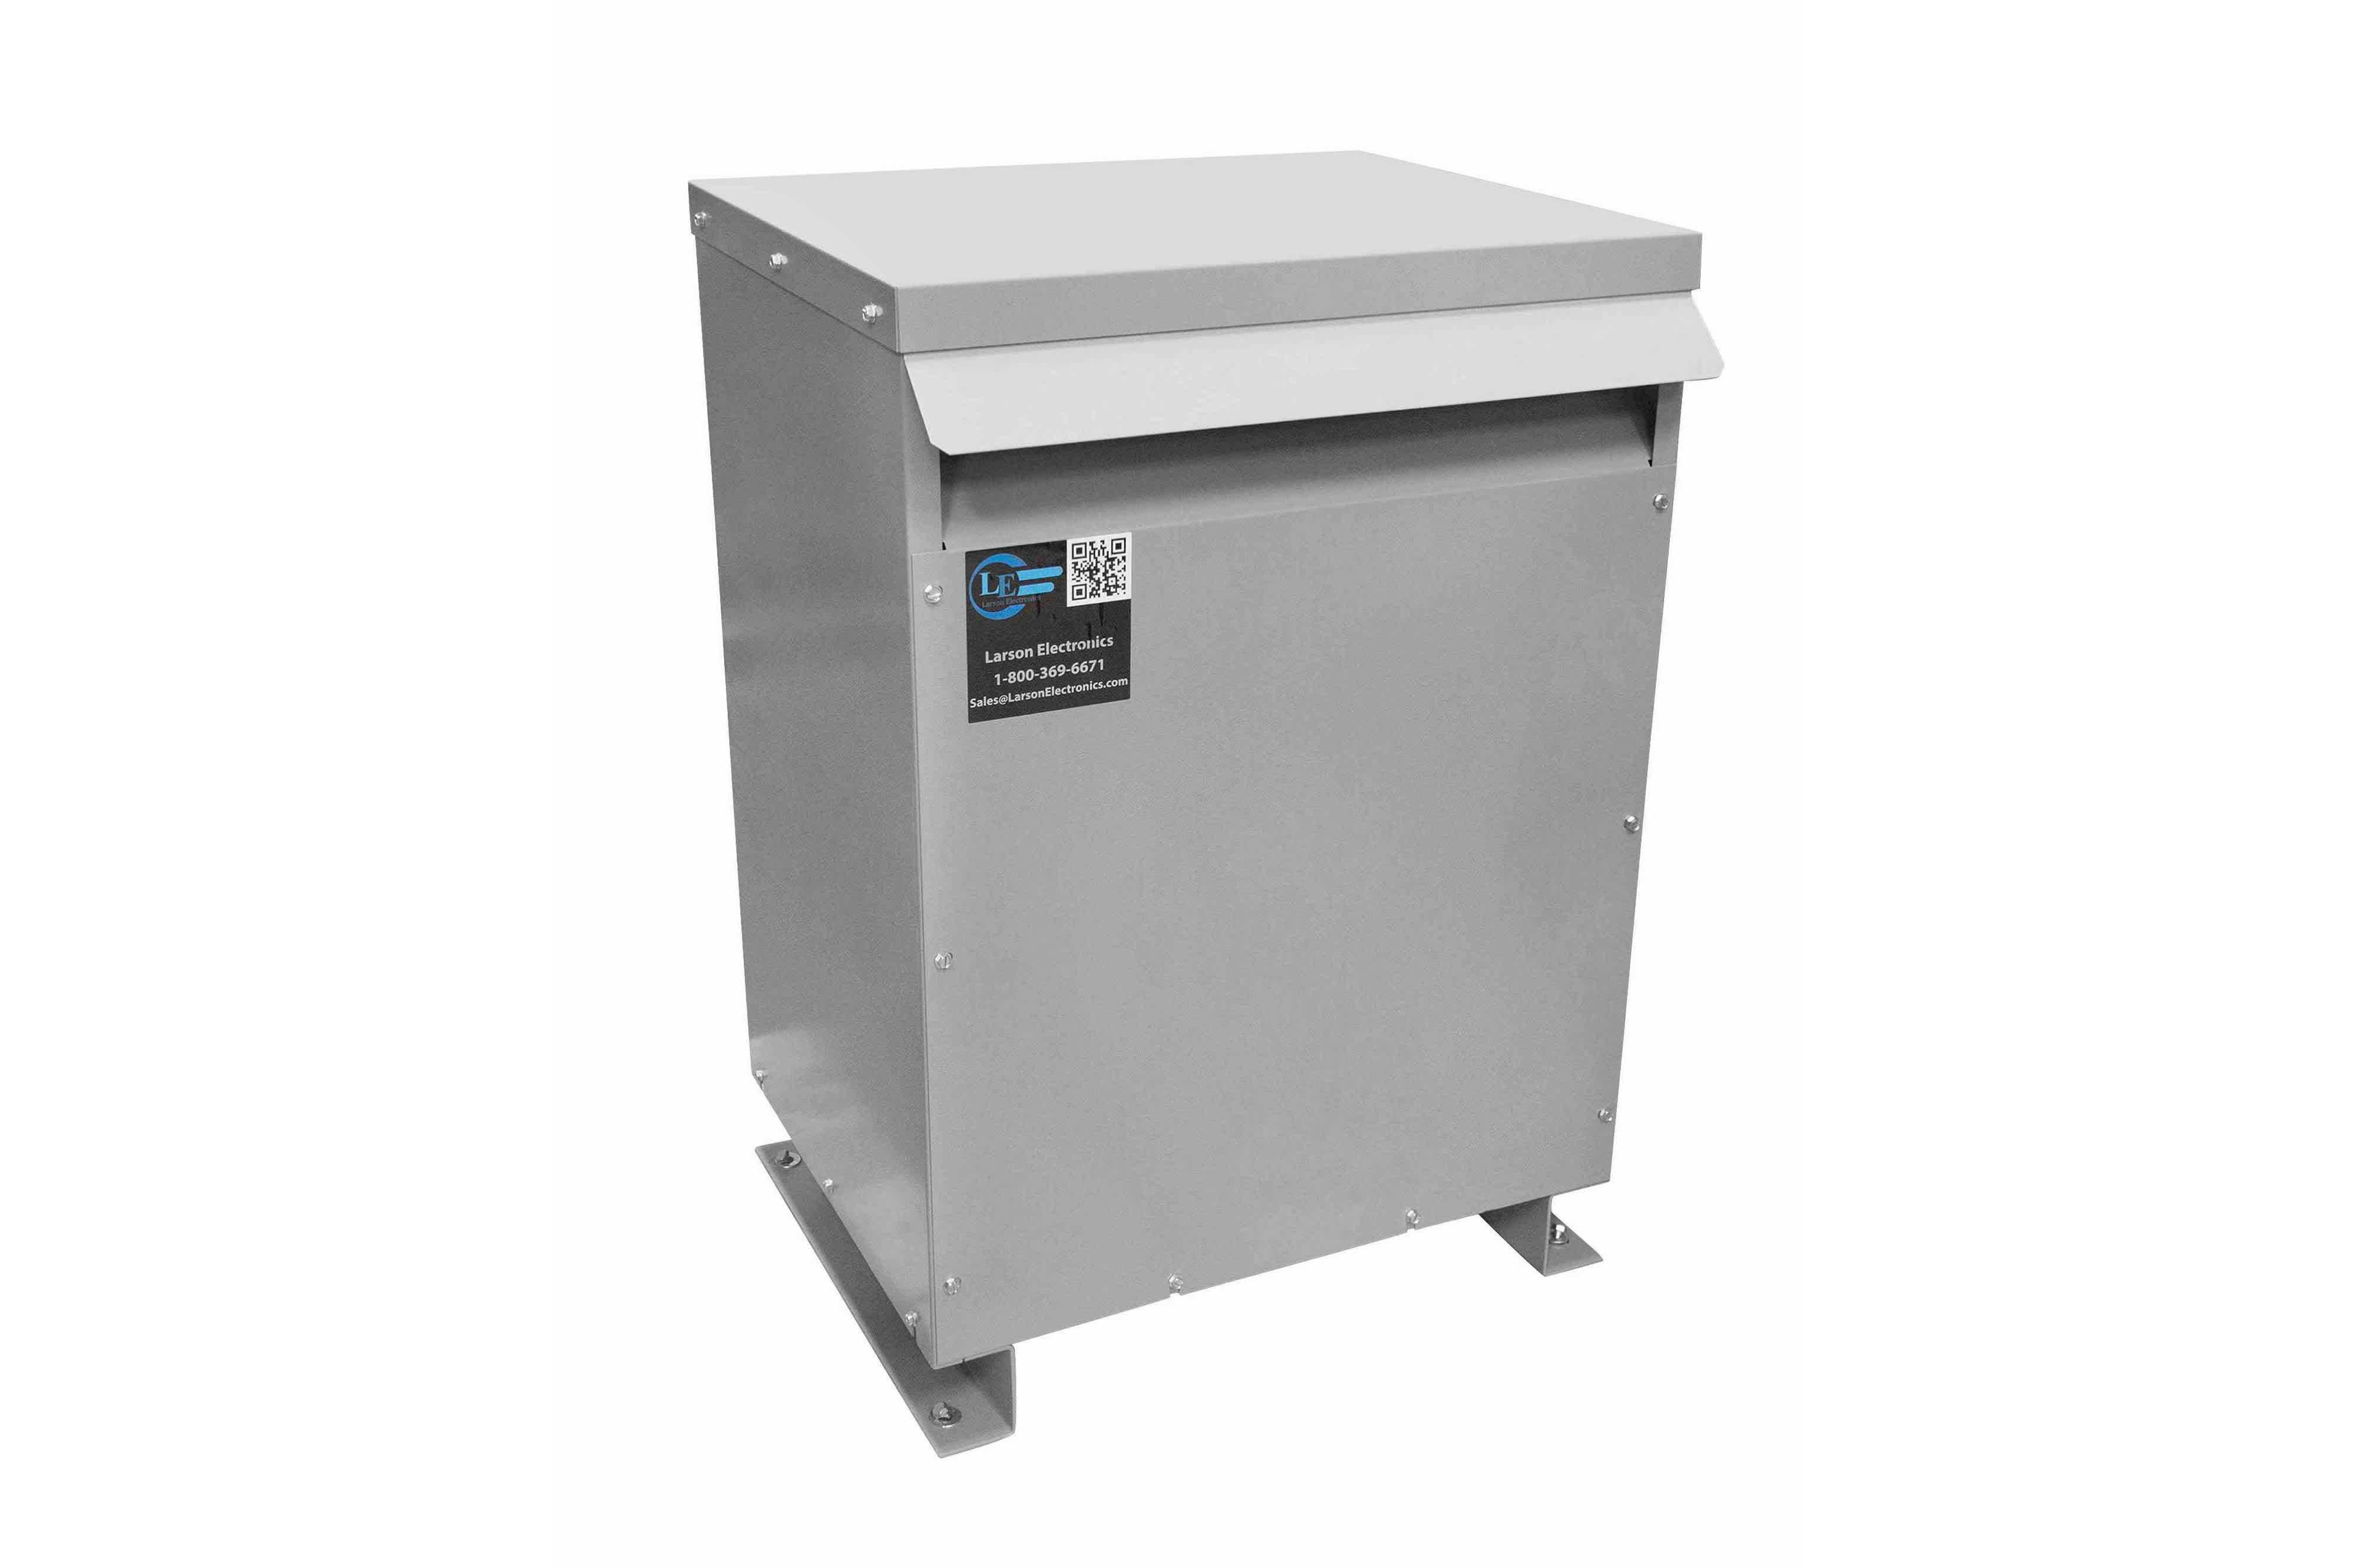 9 kVA 3PH DOE Transformer, 208V Delta Primary, 208Y/120 Wye-N Secondary, N3R, Ventilated, 60 Hz